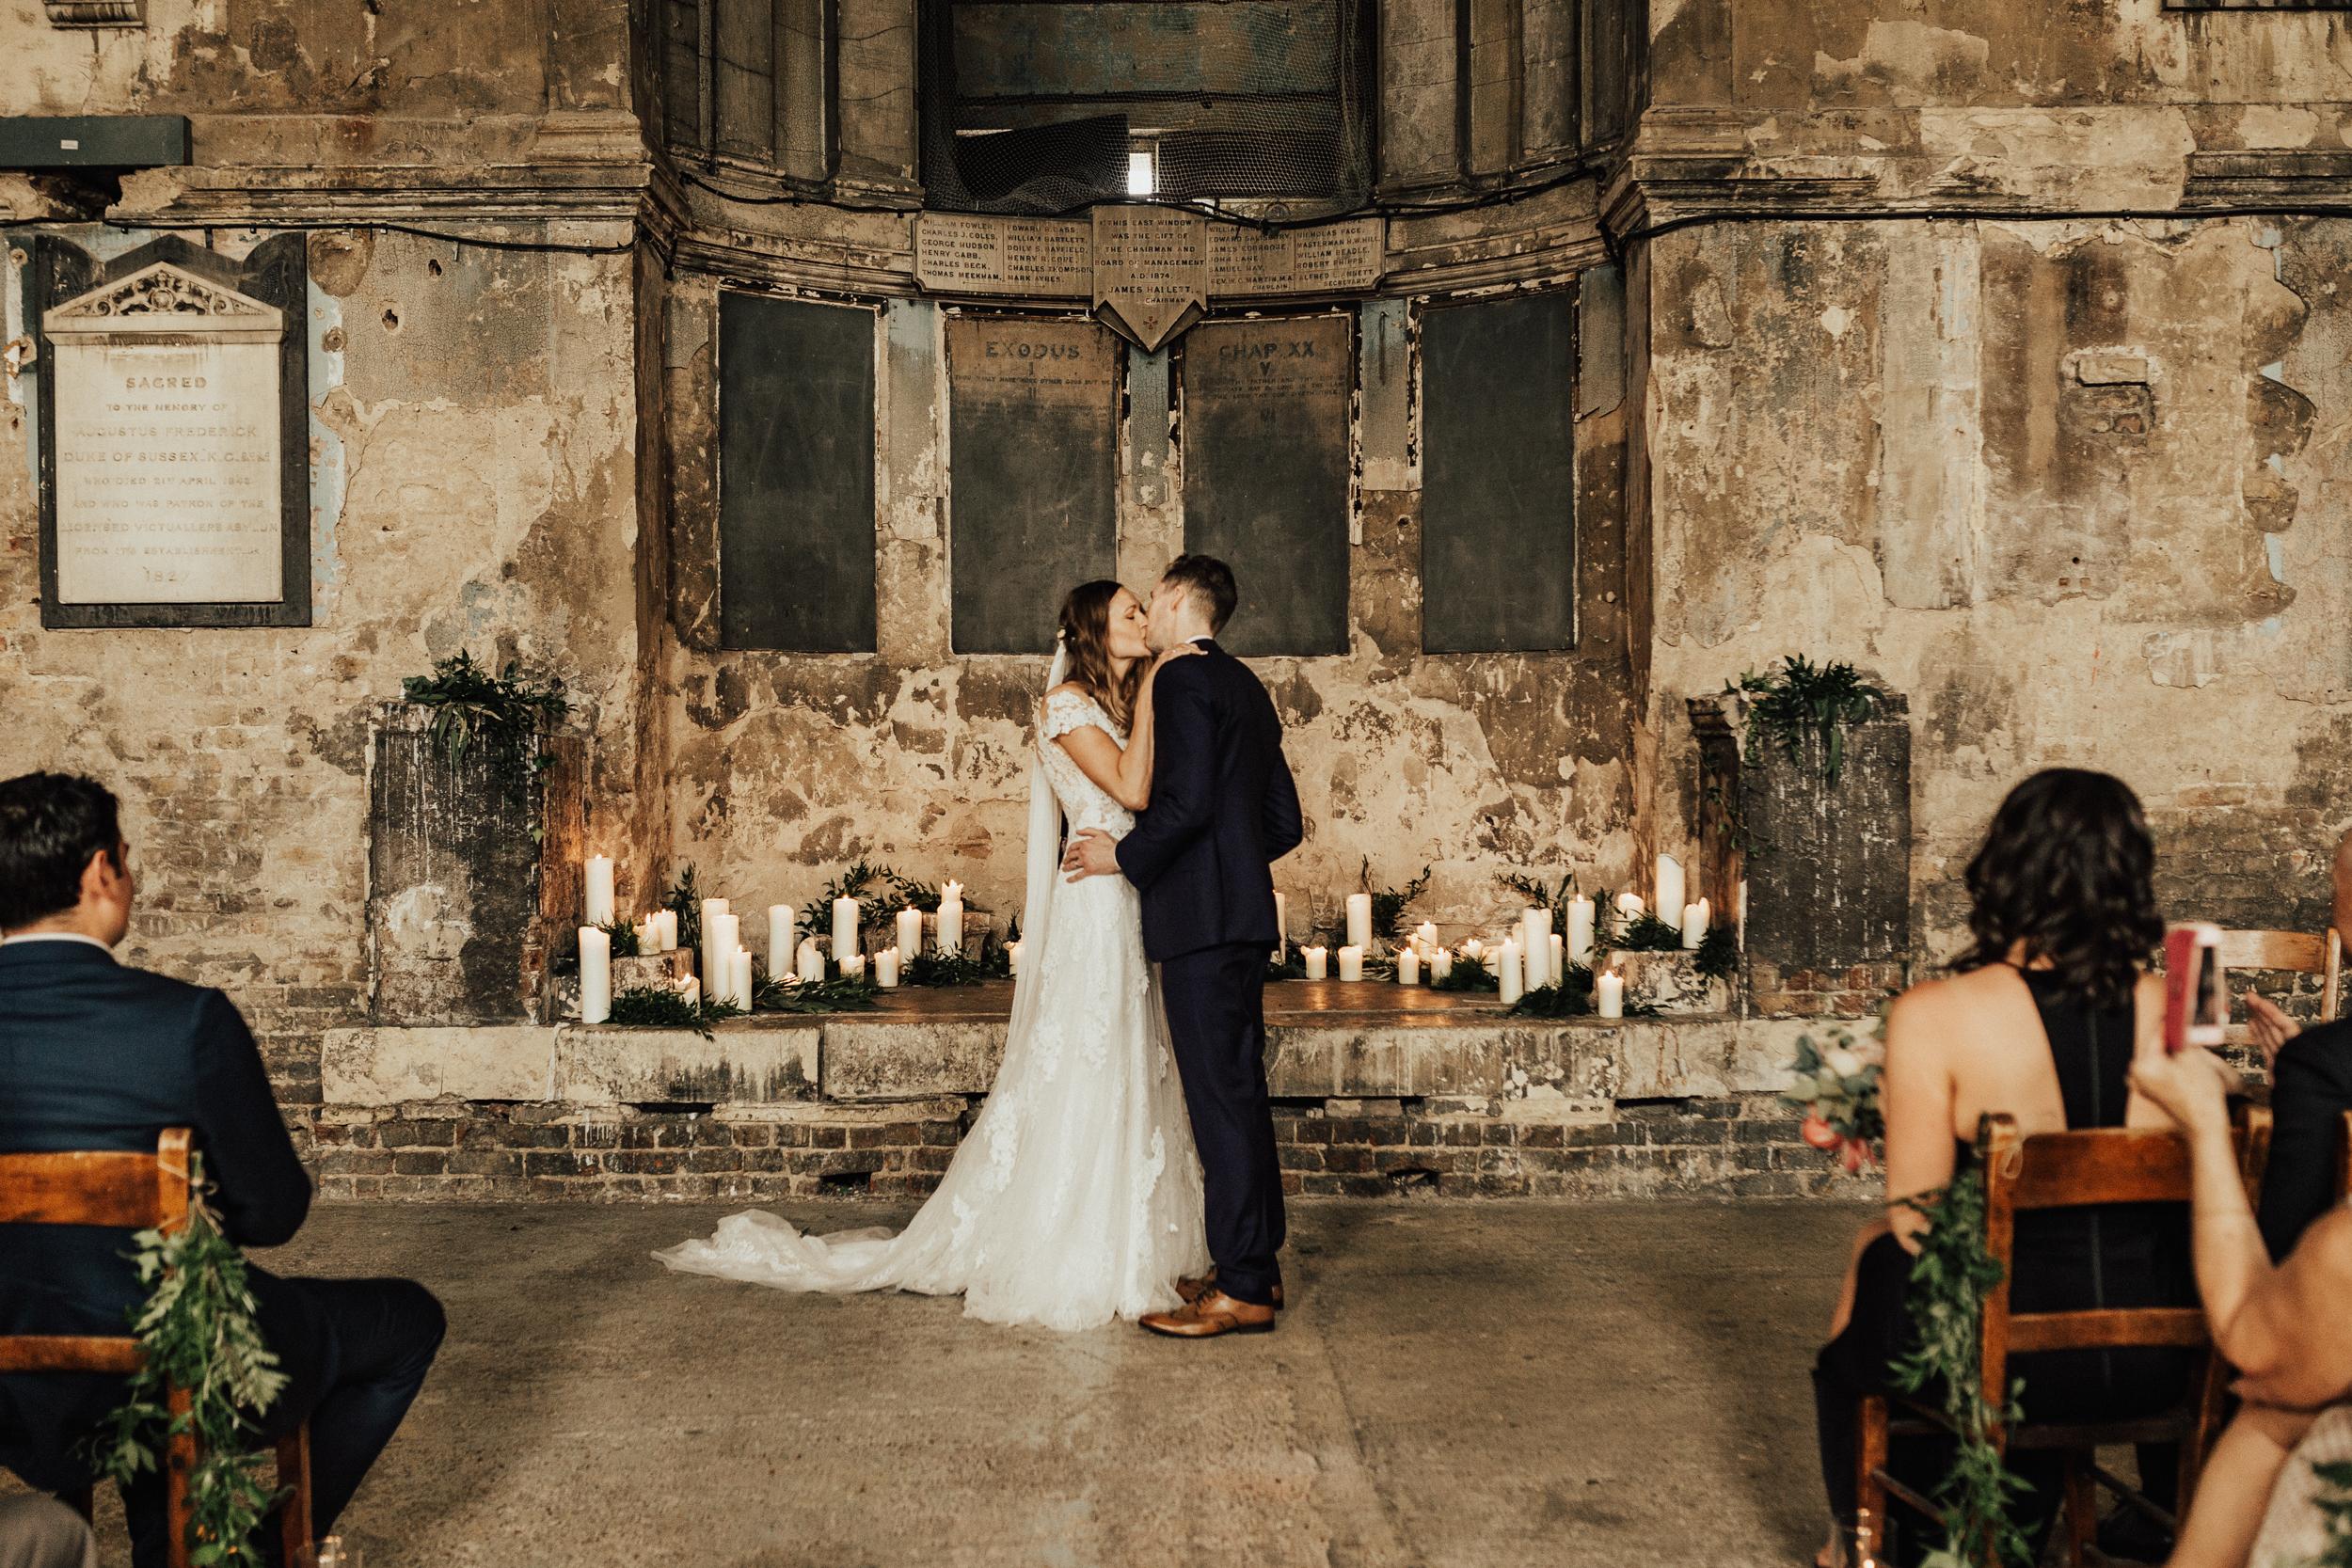 Laura-Benn-The-Asylum-London-The-Ace-Hotel-Wedding-Alternative-Darina-Stoda-Photography-213.jpg